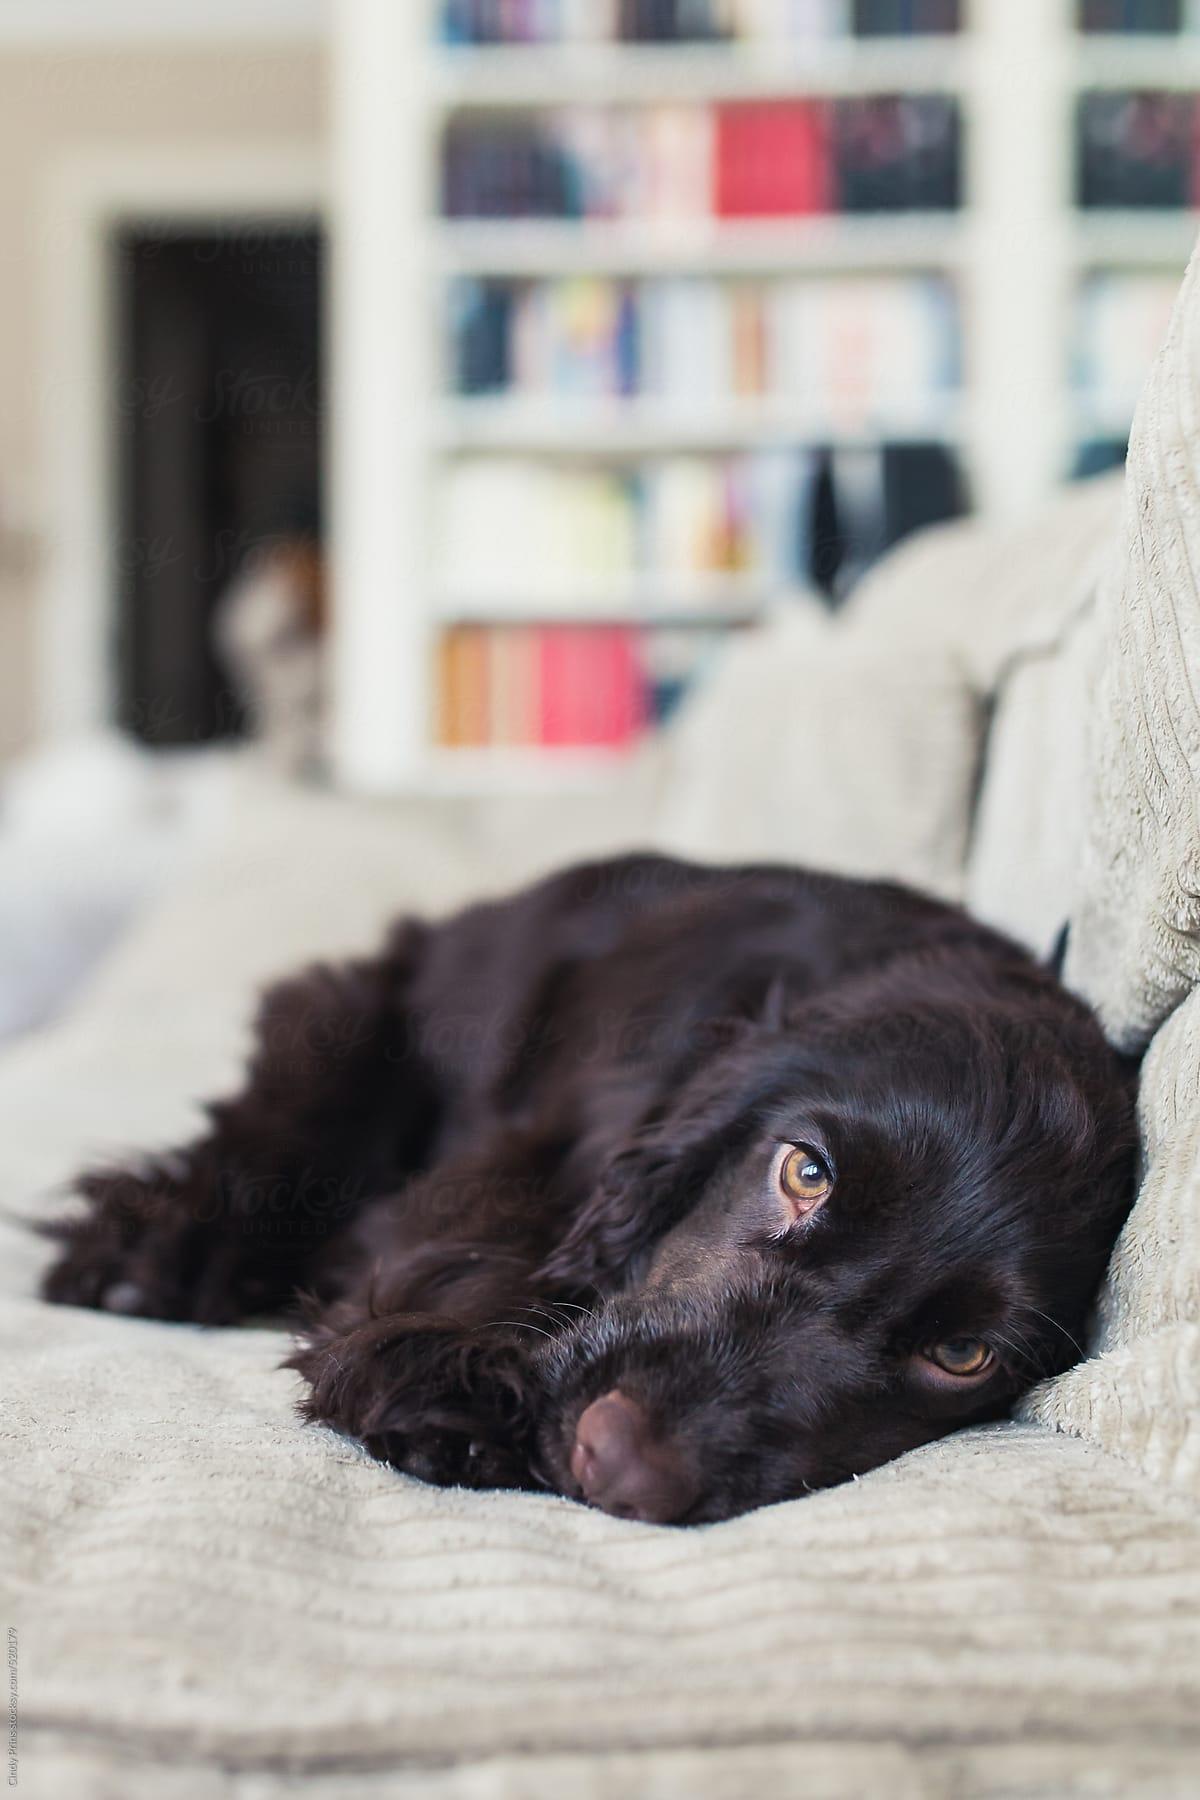 Dark Brown English Cocker Spaniel Puppy Lying On The Sofa By Cindy Prins Stocksy United